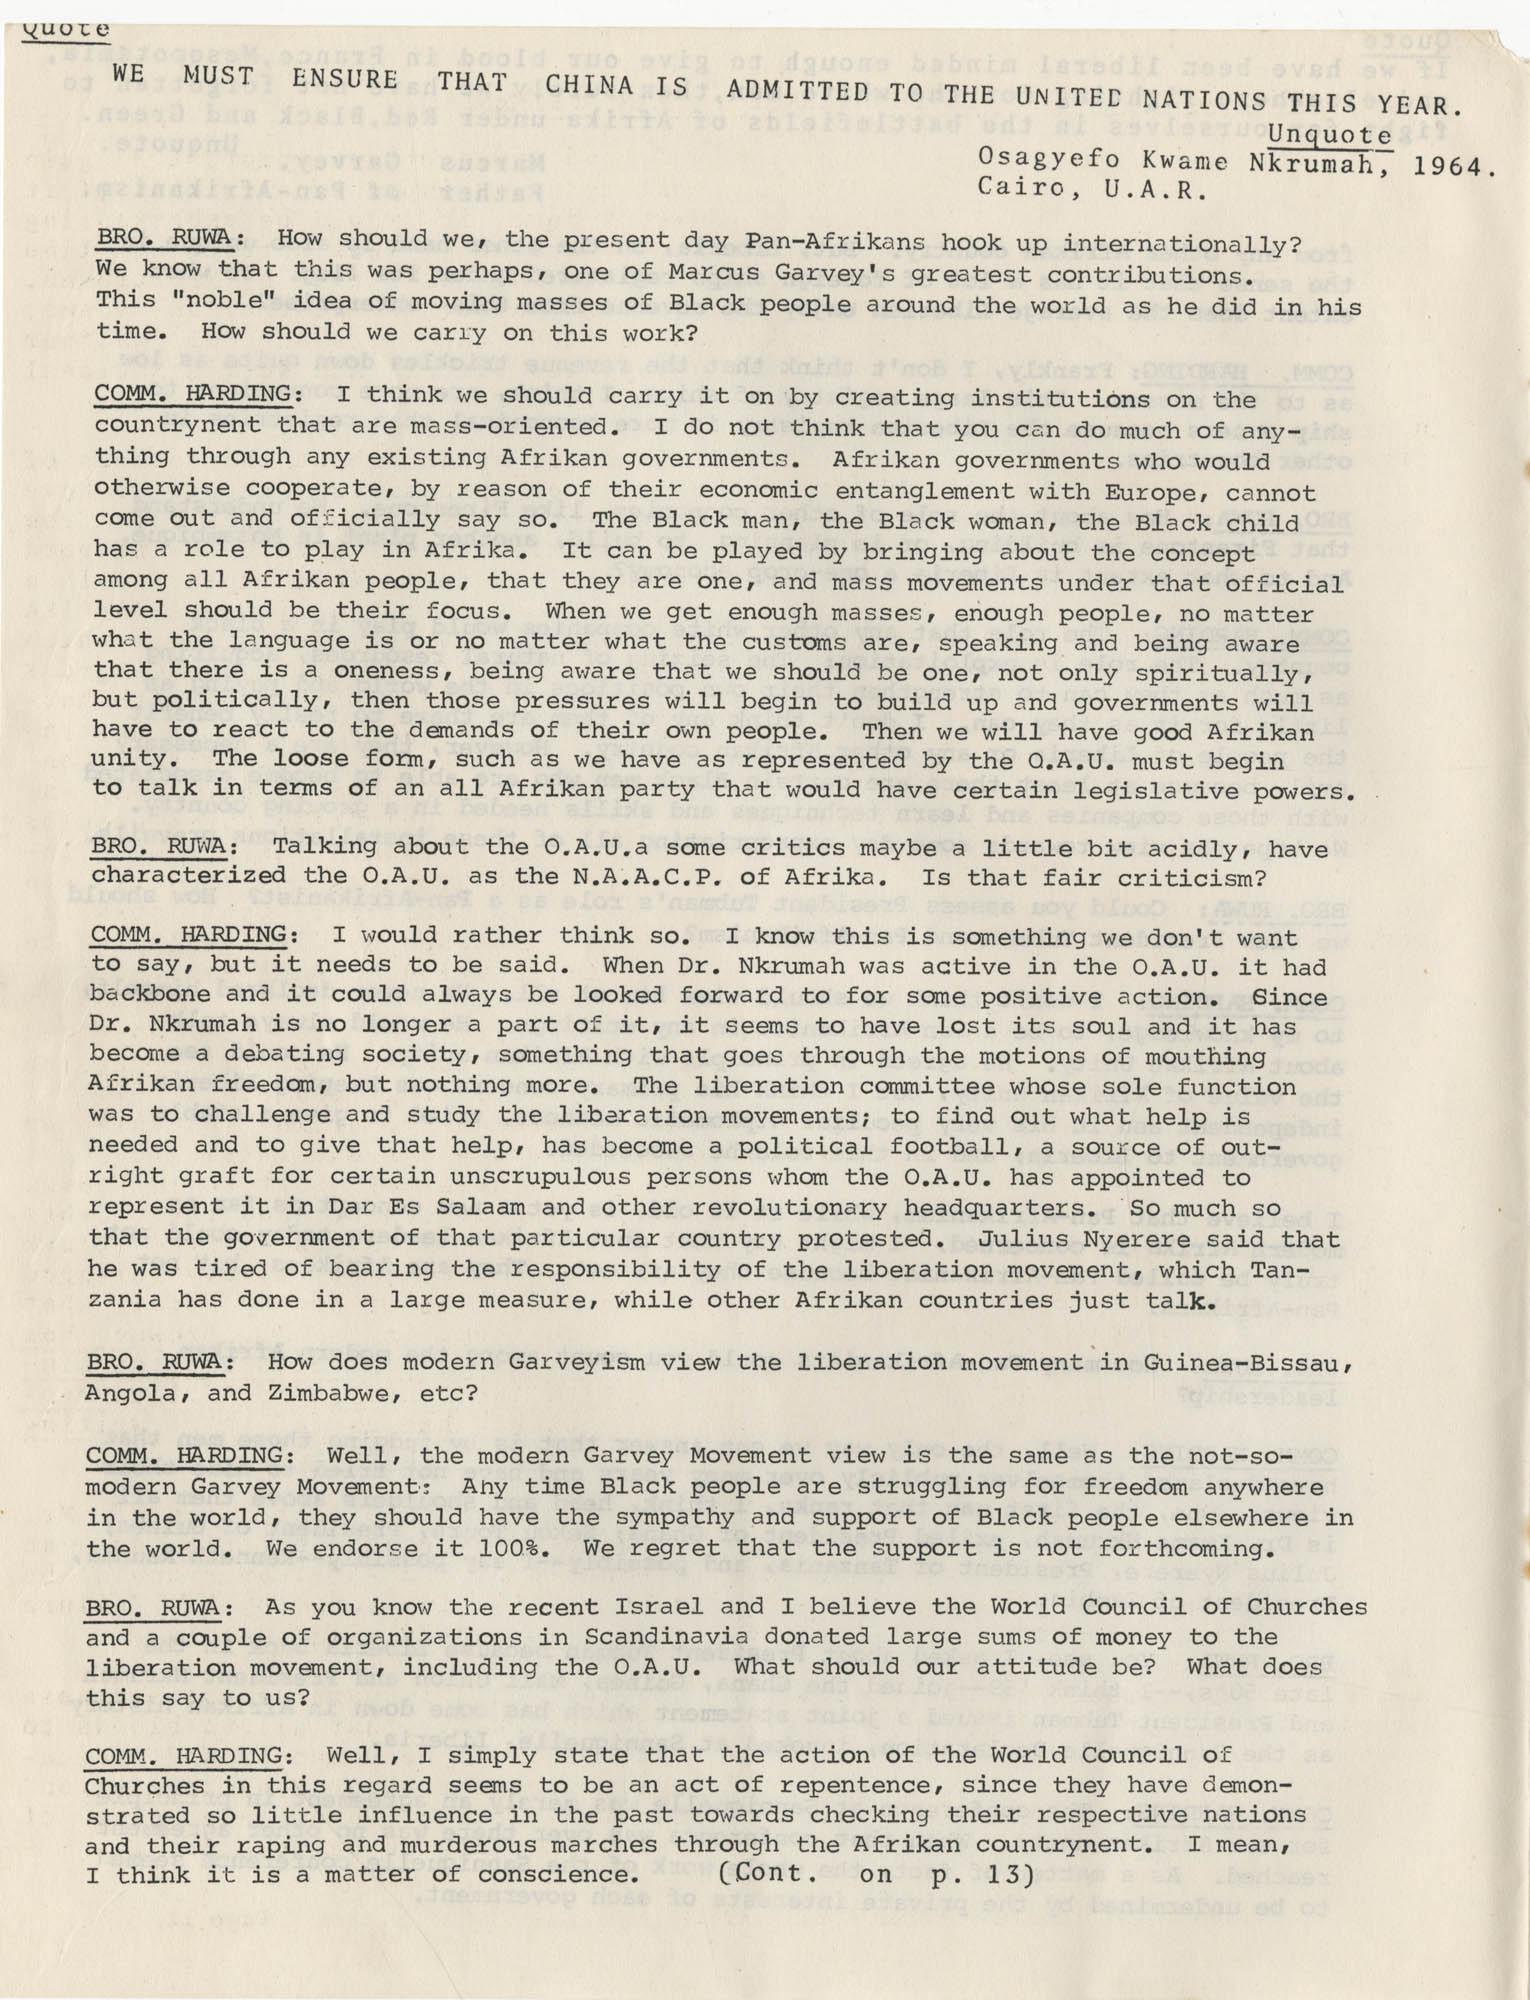 Afrika Must Unite, Vol. 1, No. 4, Page 10